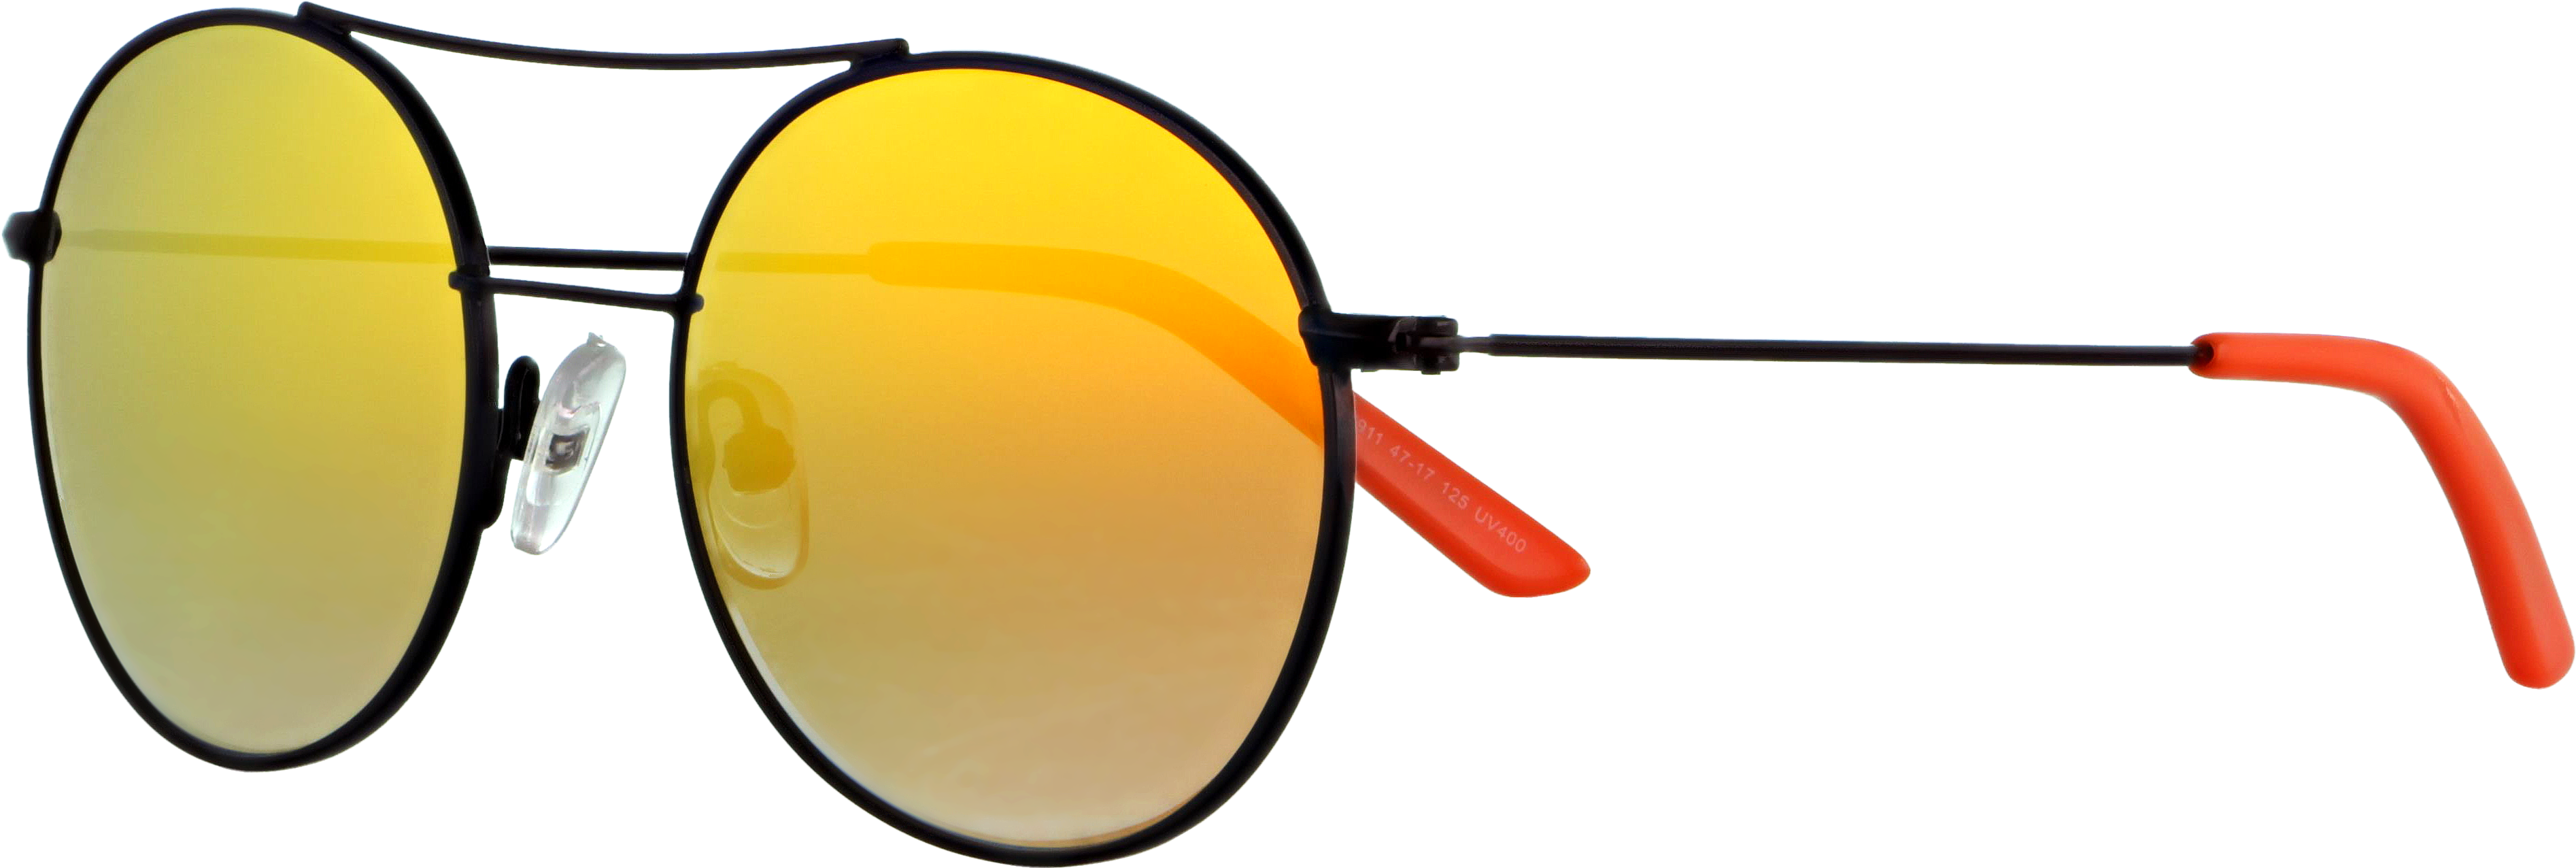 abele optik Kindersonnenbrille 717911